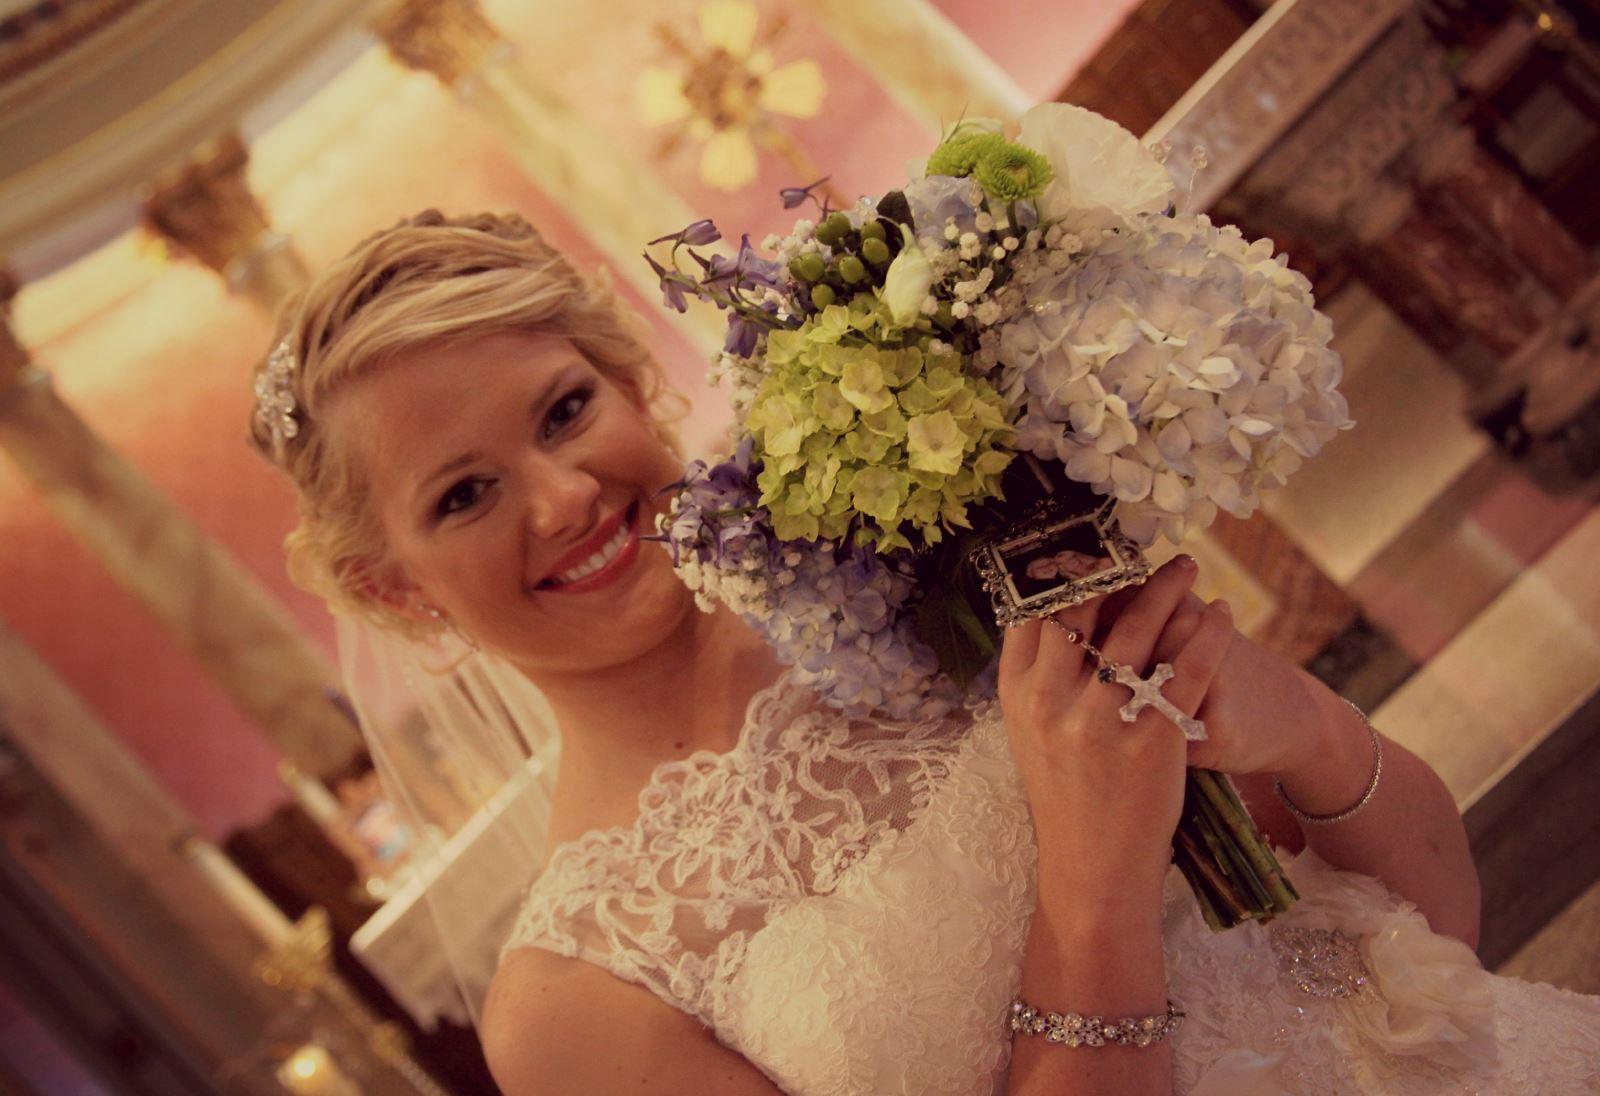 Wedding Dress Cleaning And Preservation Cincinnati - Wedding Dress ...